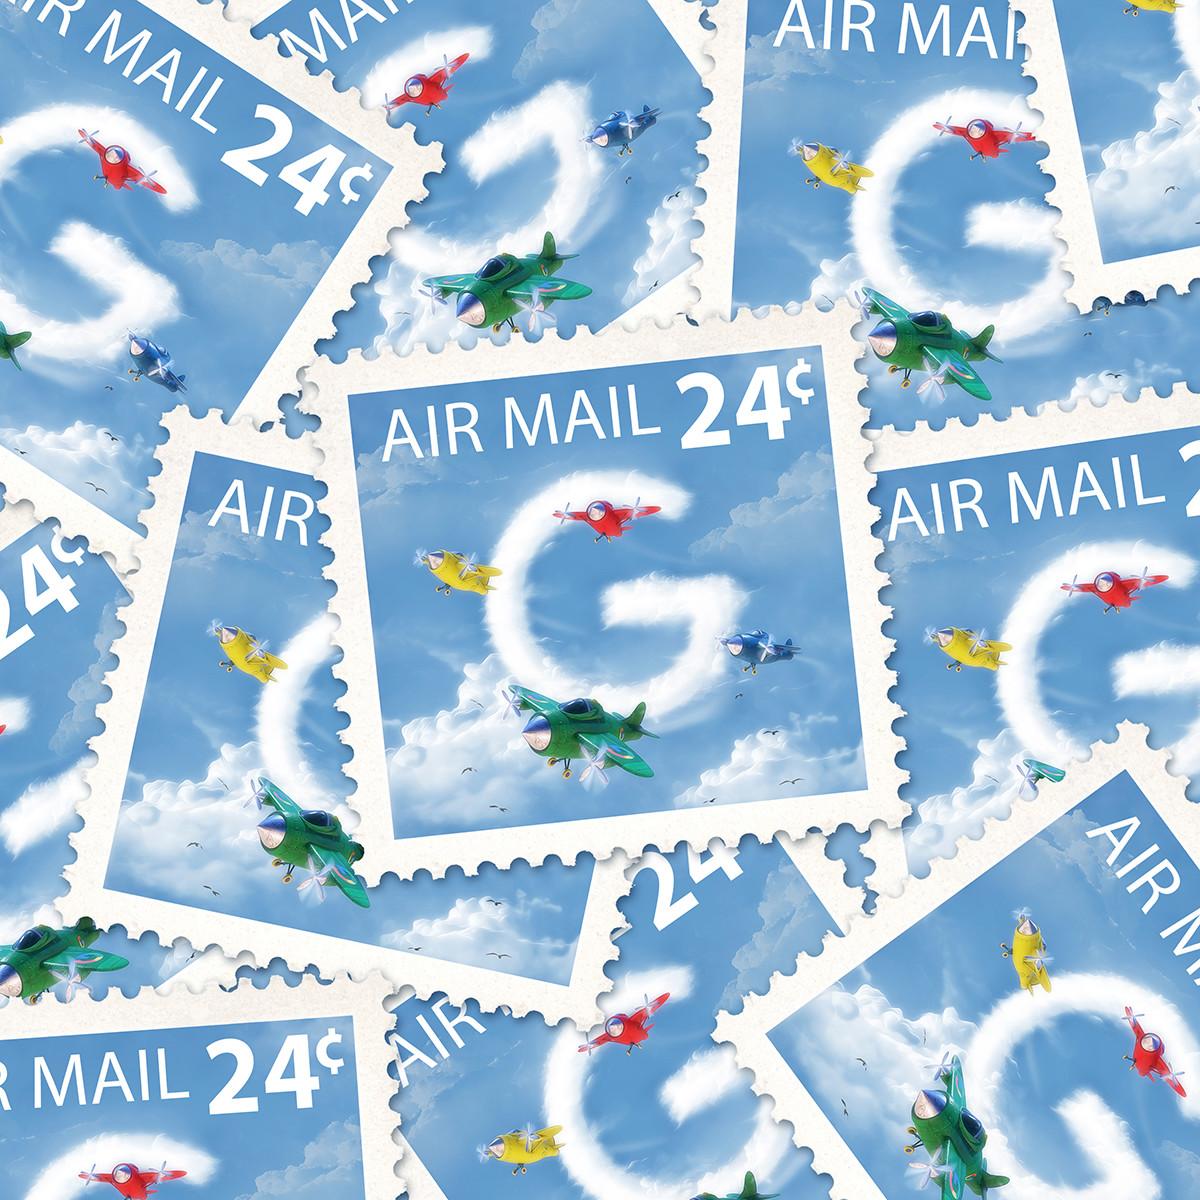 Tomislav zvonaric air mail scene